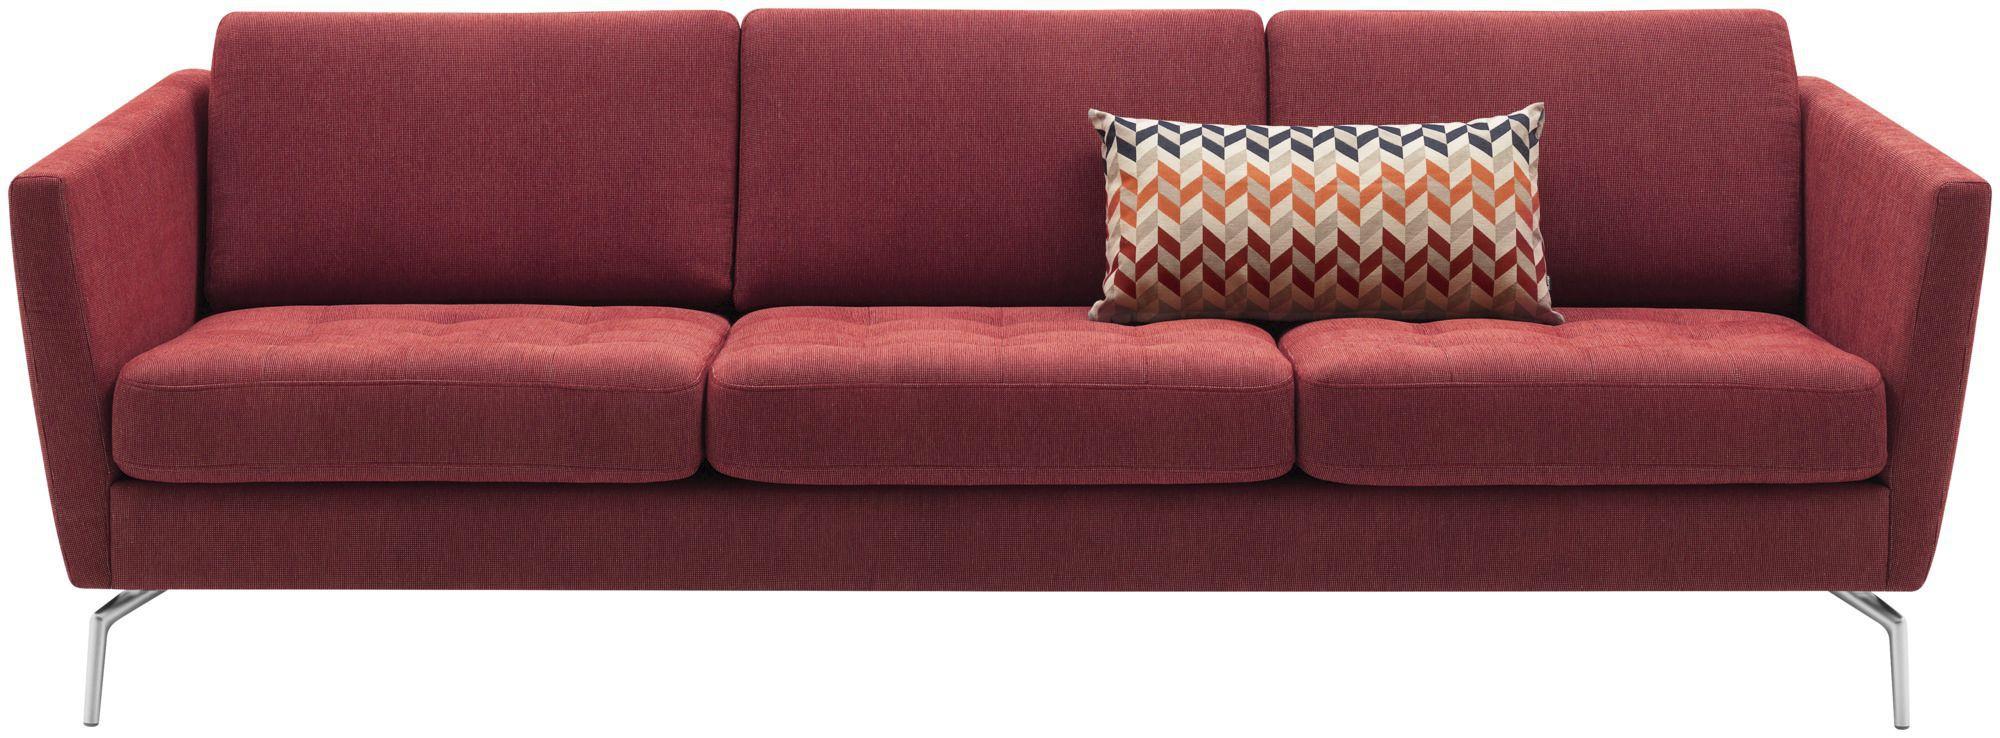 Wunderbar Hellblaues Sofa Ideen Von Ecksofa / Modern / Leder / Stoff